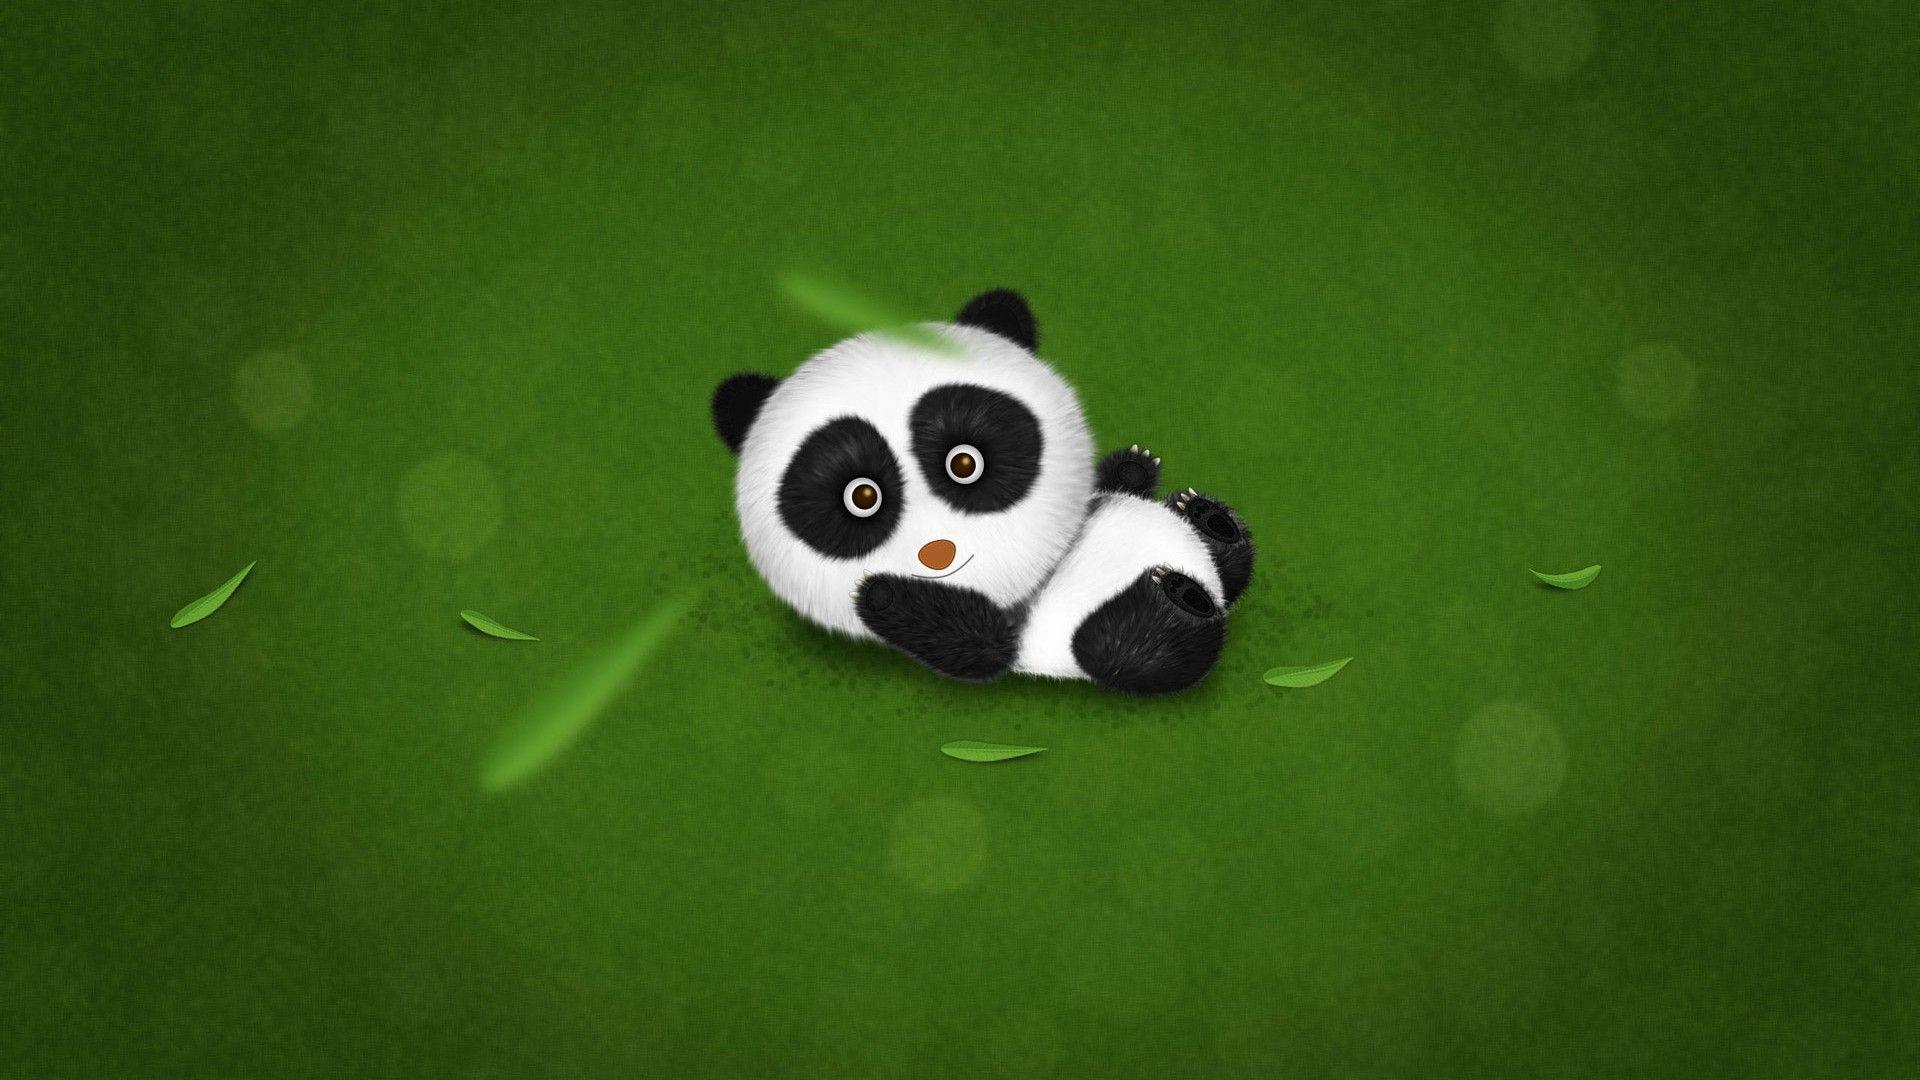 Cute Panda Desktop Wallpaper Best Hd Wallpapers Panda Wallpapers Panda Background Cute Panda Wallpaper